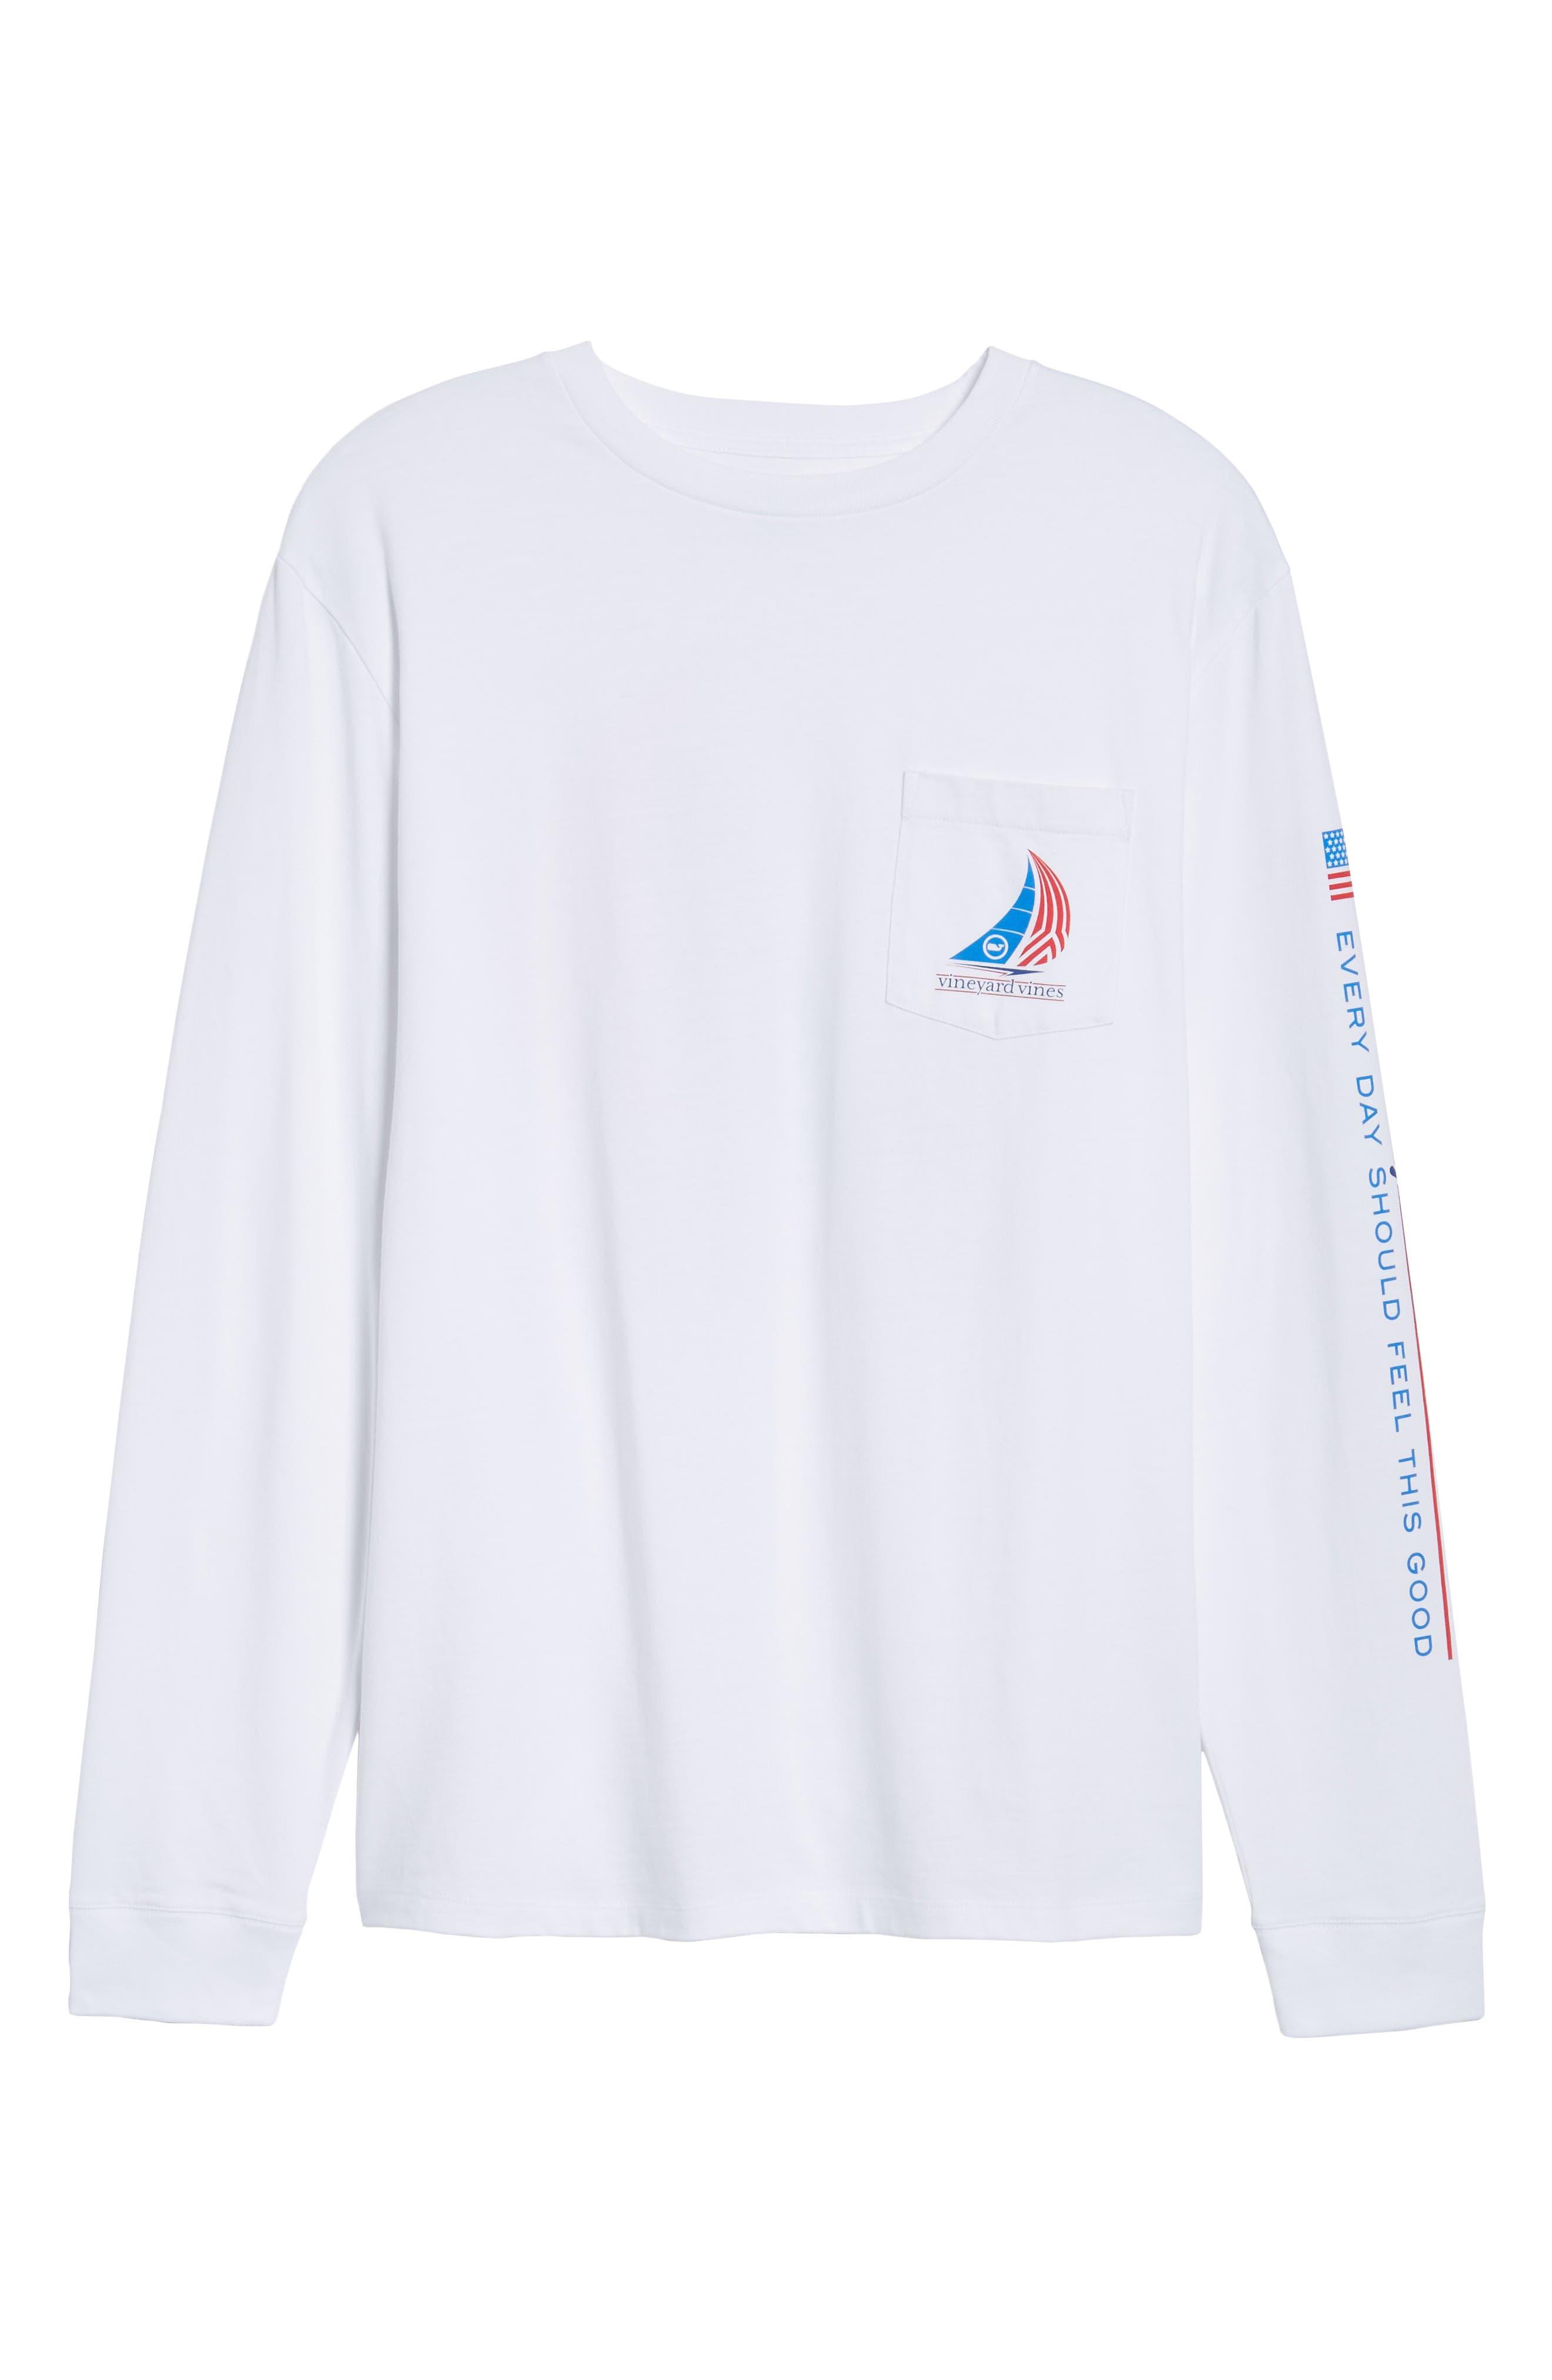 Spinnaker Sail Long Sleeve Pocket T-Shirt,                             Alternate thumbnail 6, color,                             White Cap